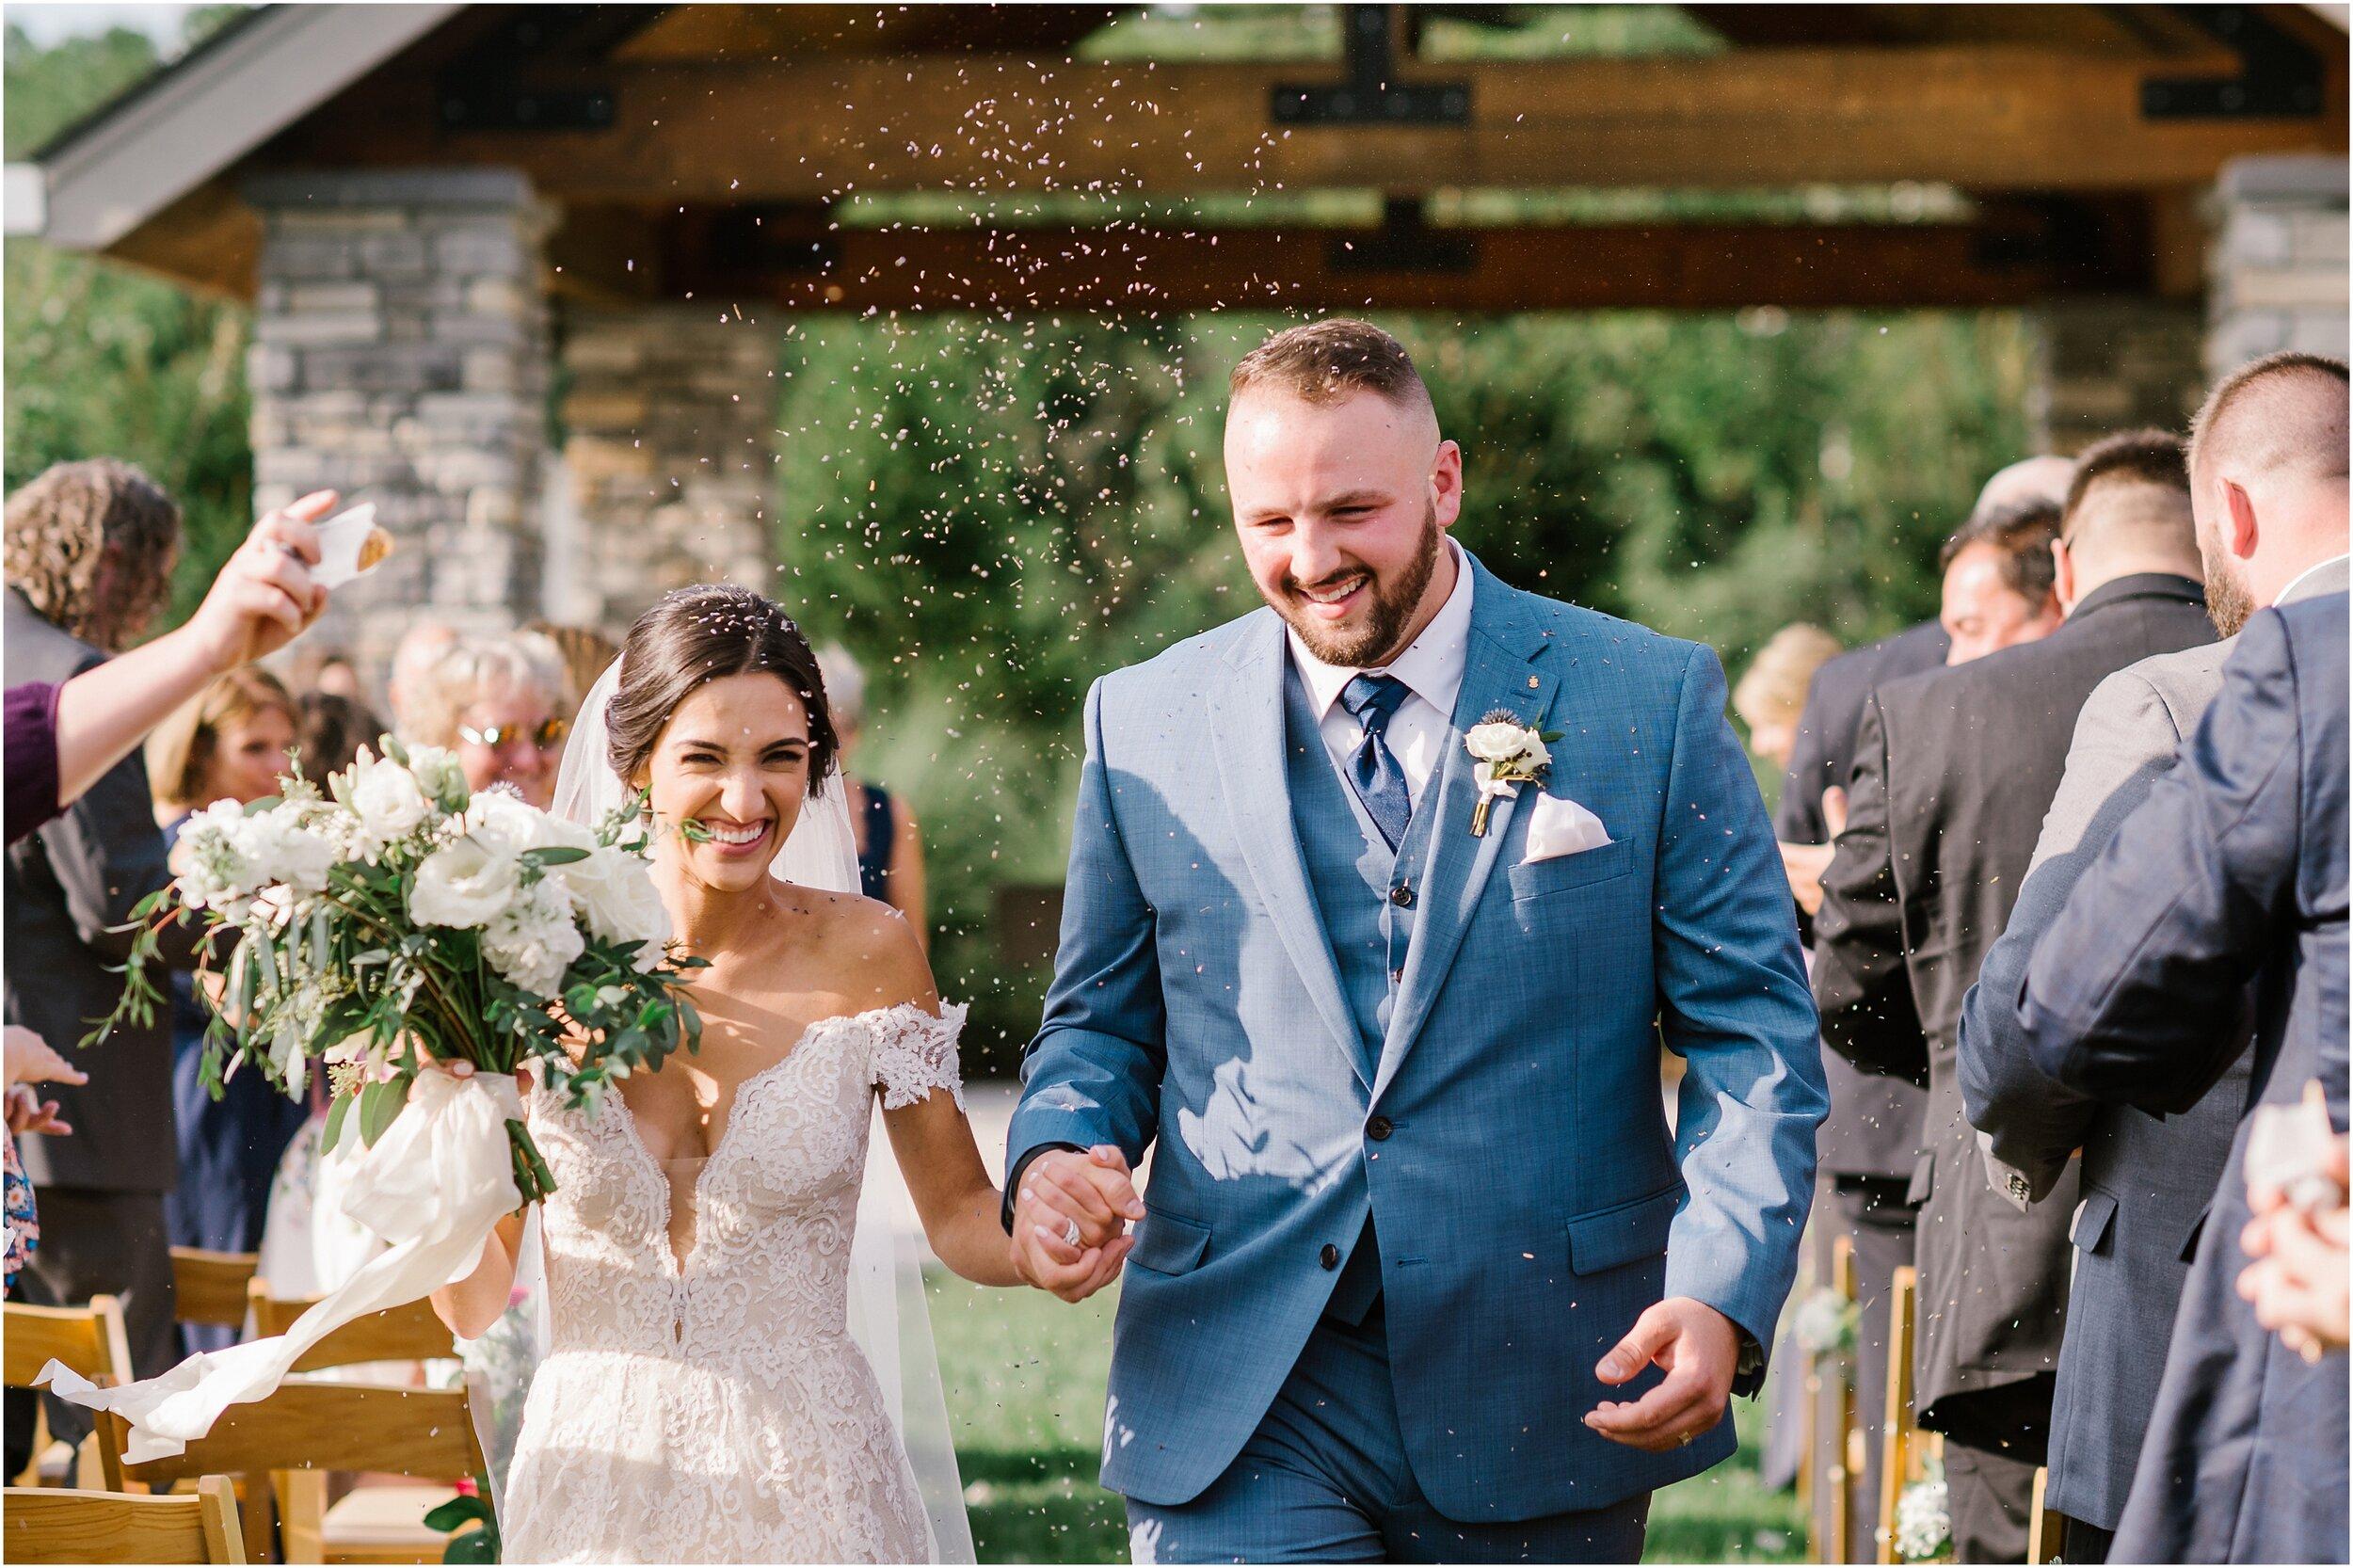 Rebecca Shehorn Photography Indianapolis Wedding Photographer Sycamore at Mallow Run_0746.jpg